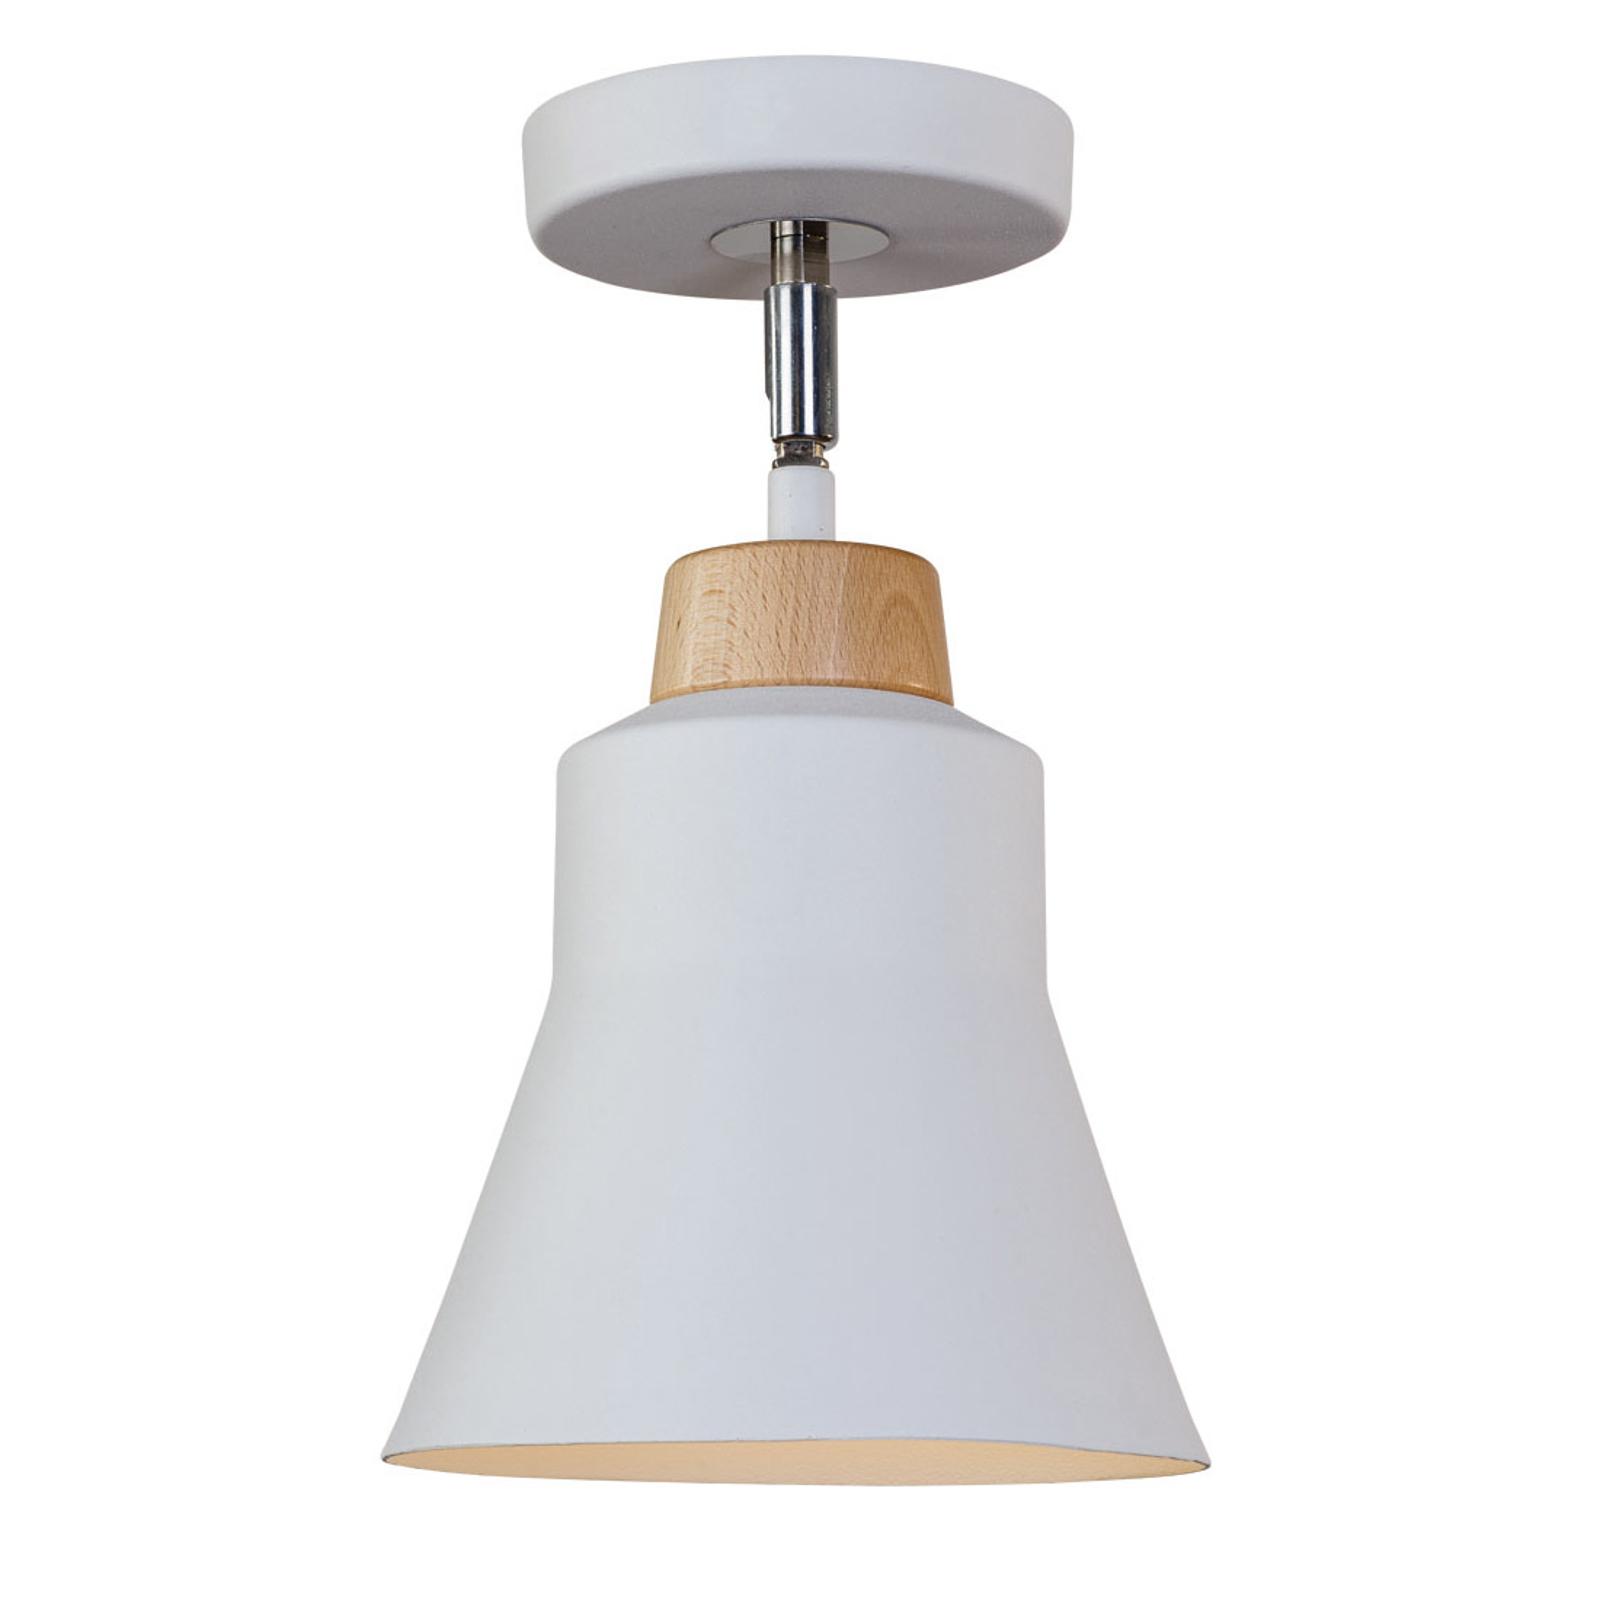 Lampa sufitowa Wood z metalu, biała